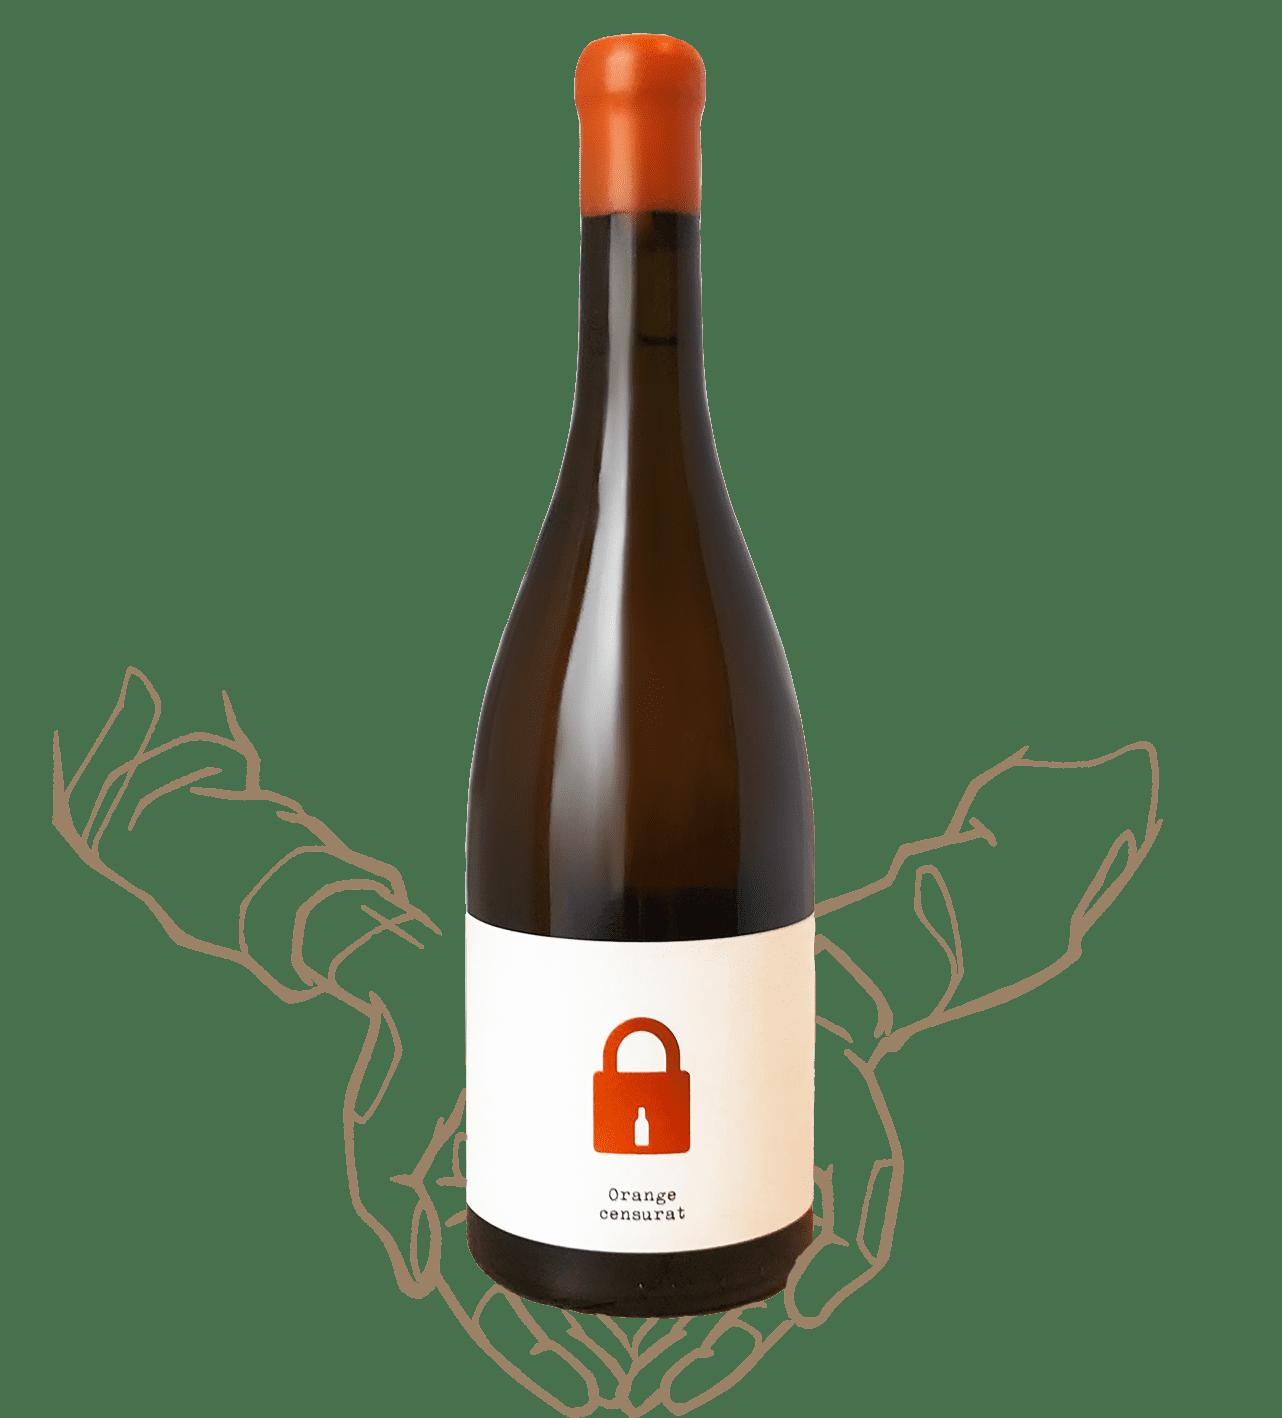 Orange censurat est un vin naturel de la bodega clandestina